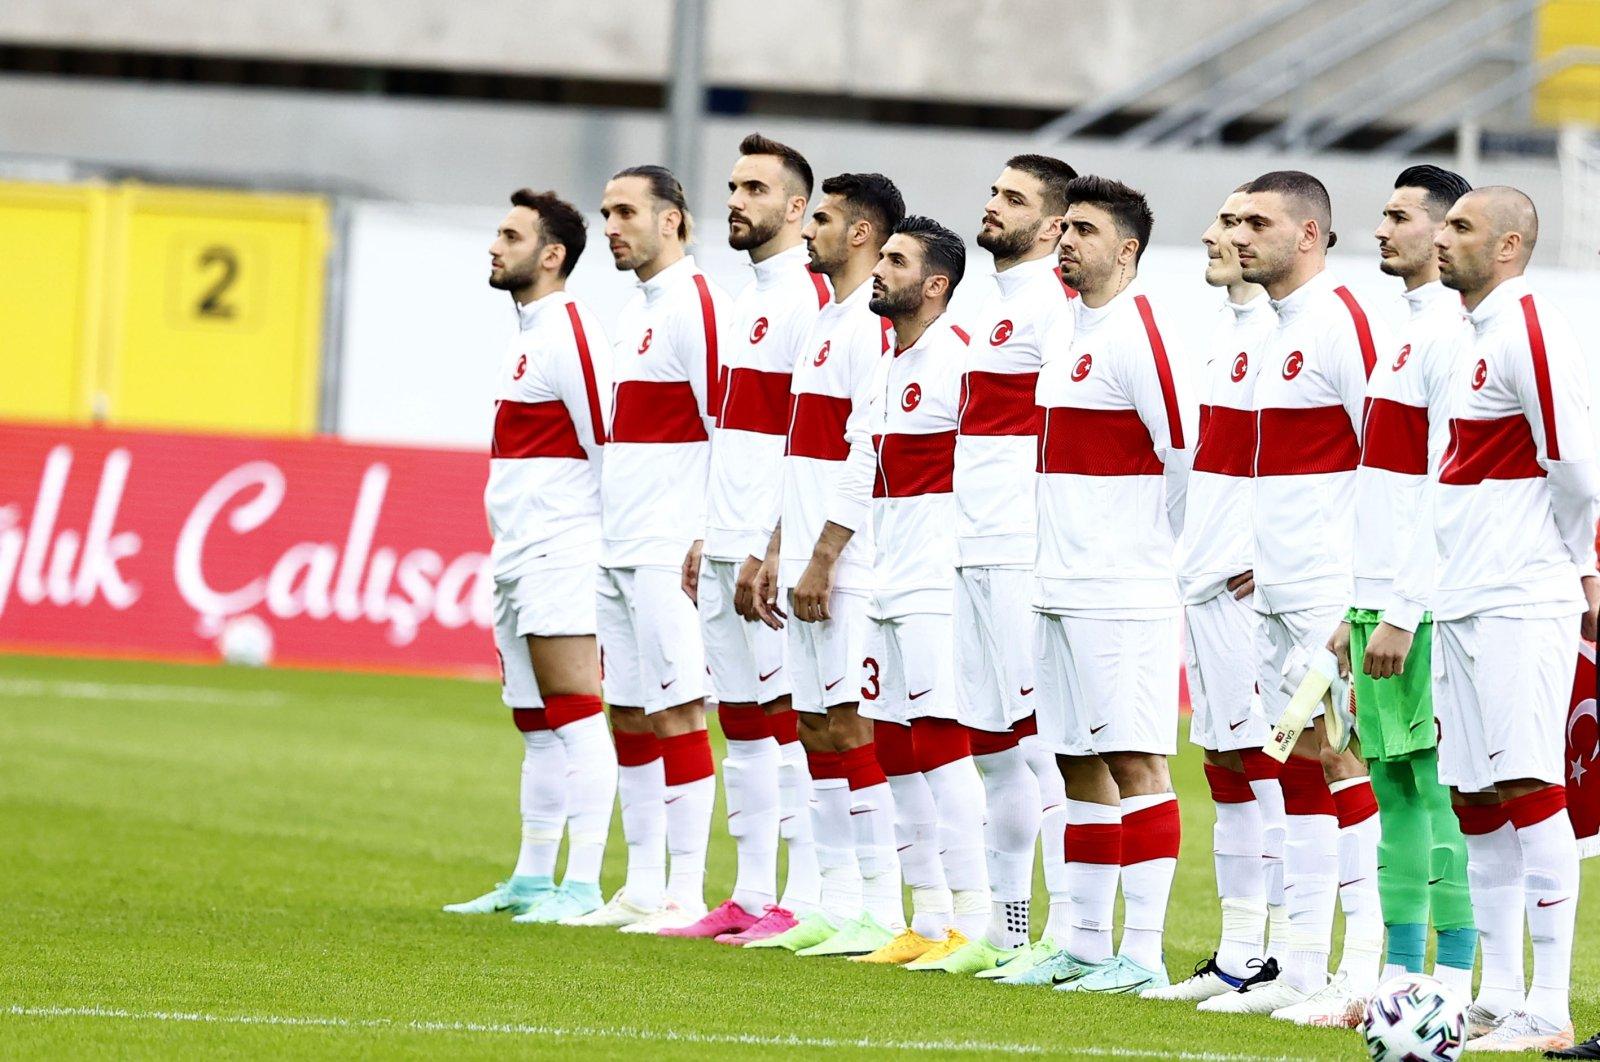 Turkish national team ahead of an international friendly against Moldova, Paderborn, Germany, June 3, 2021.